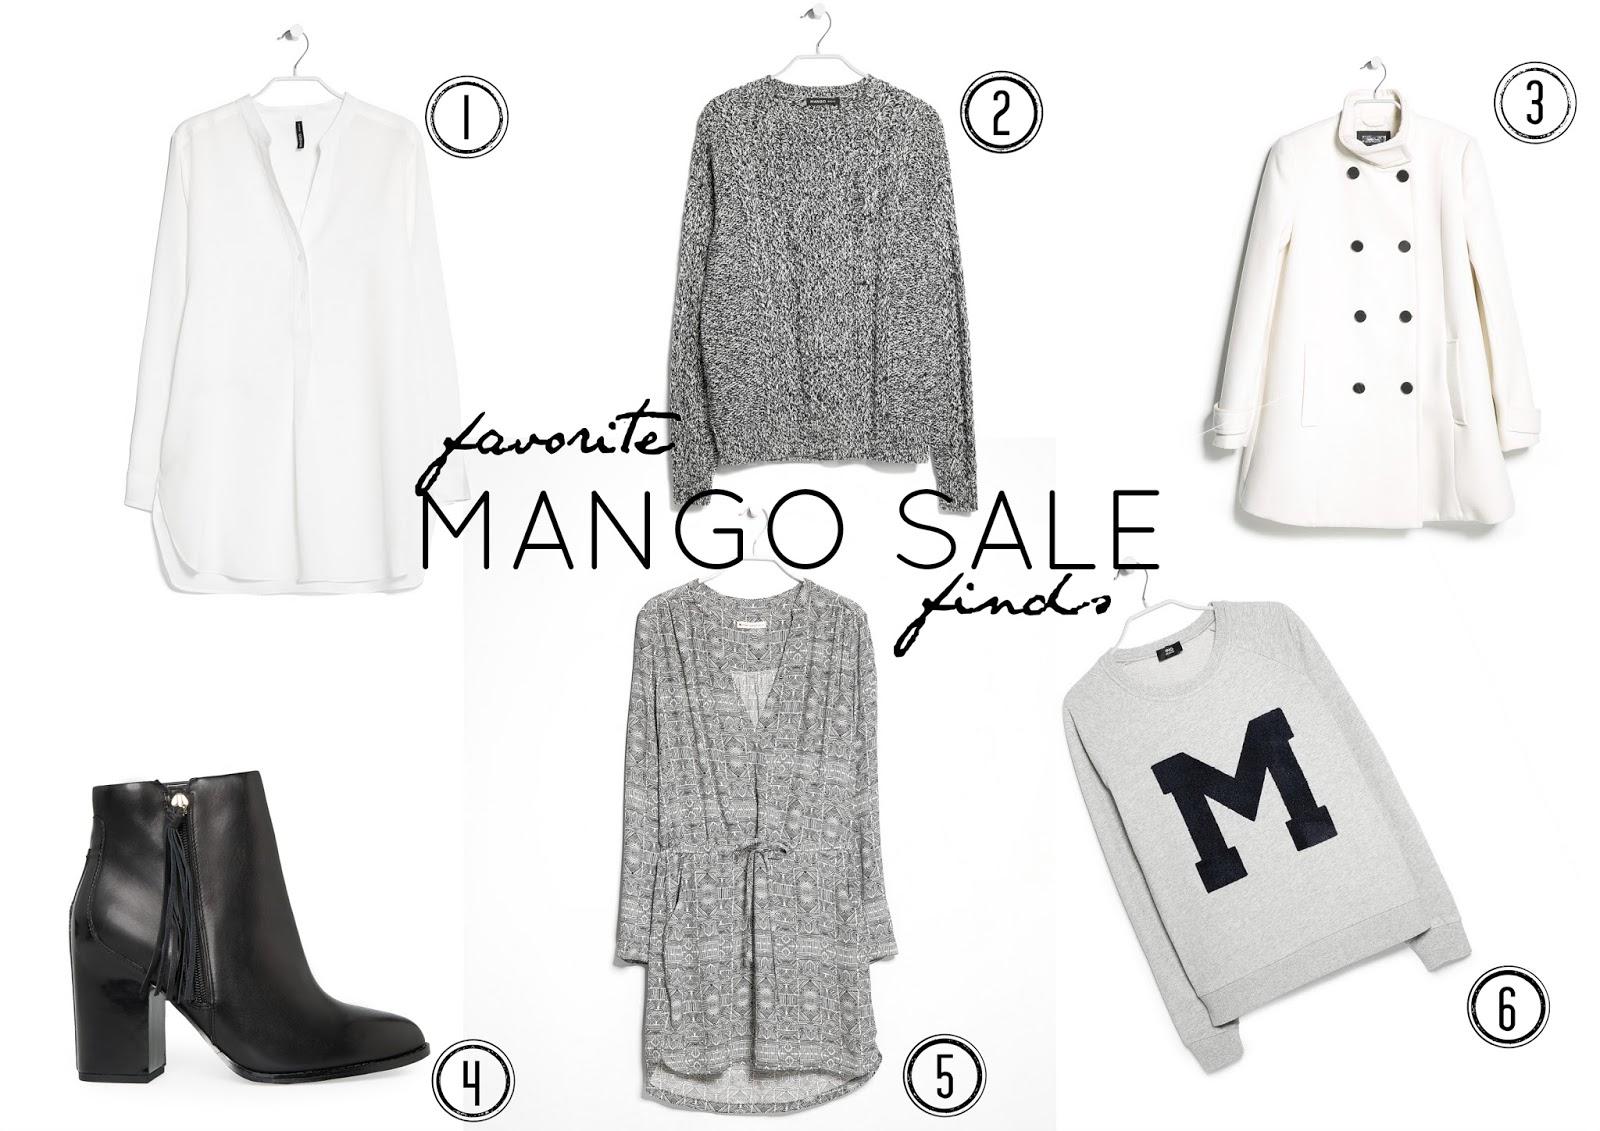 Mango Sale TheBlondeLion Monochrome Black White